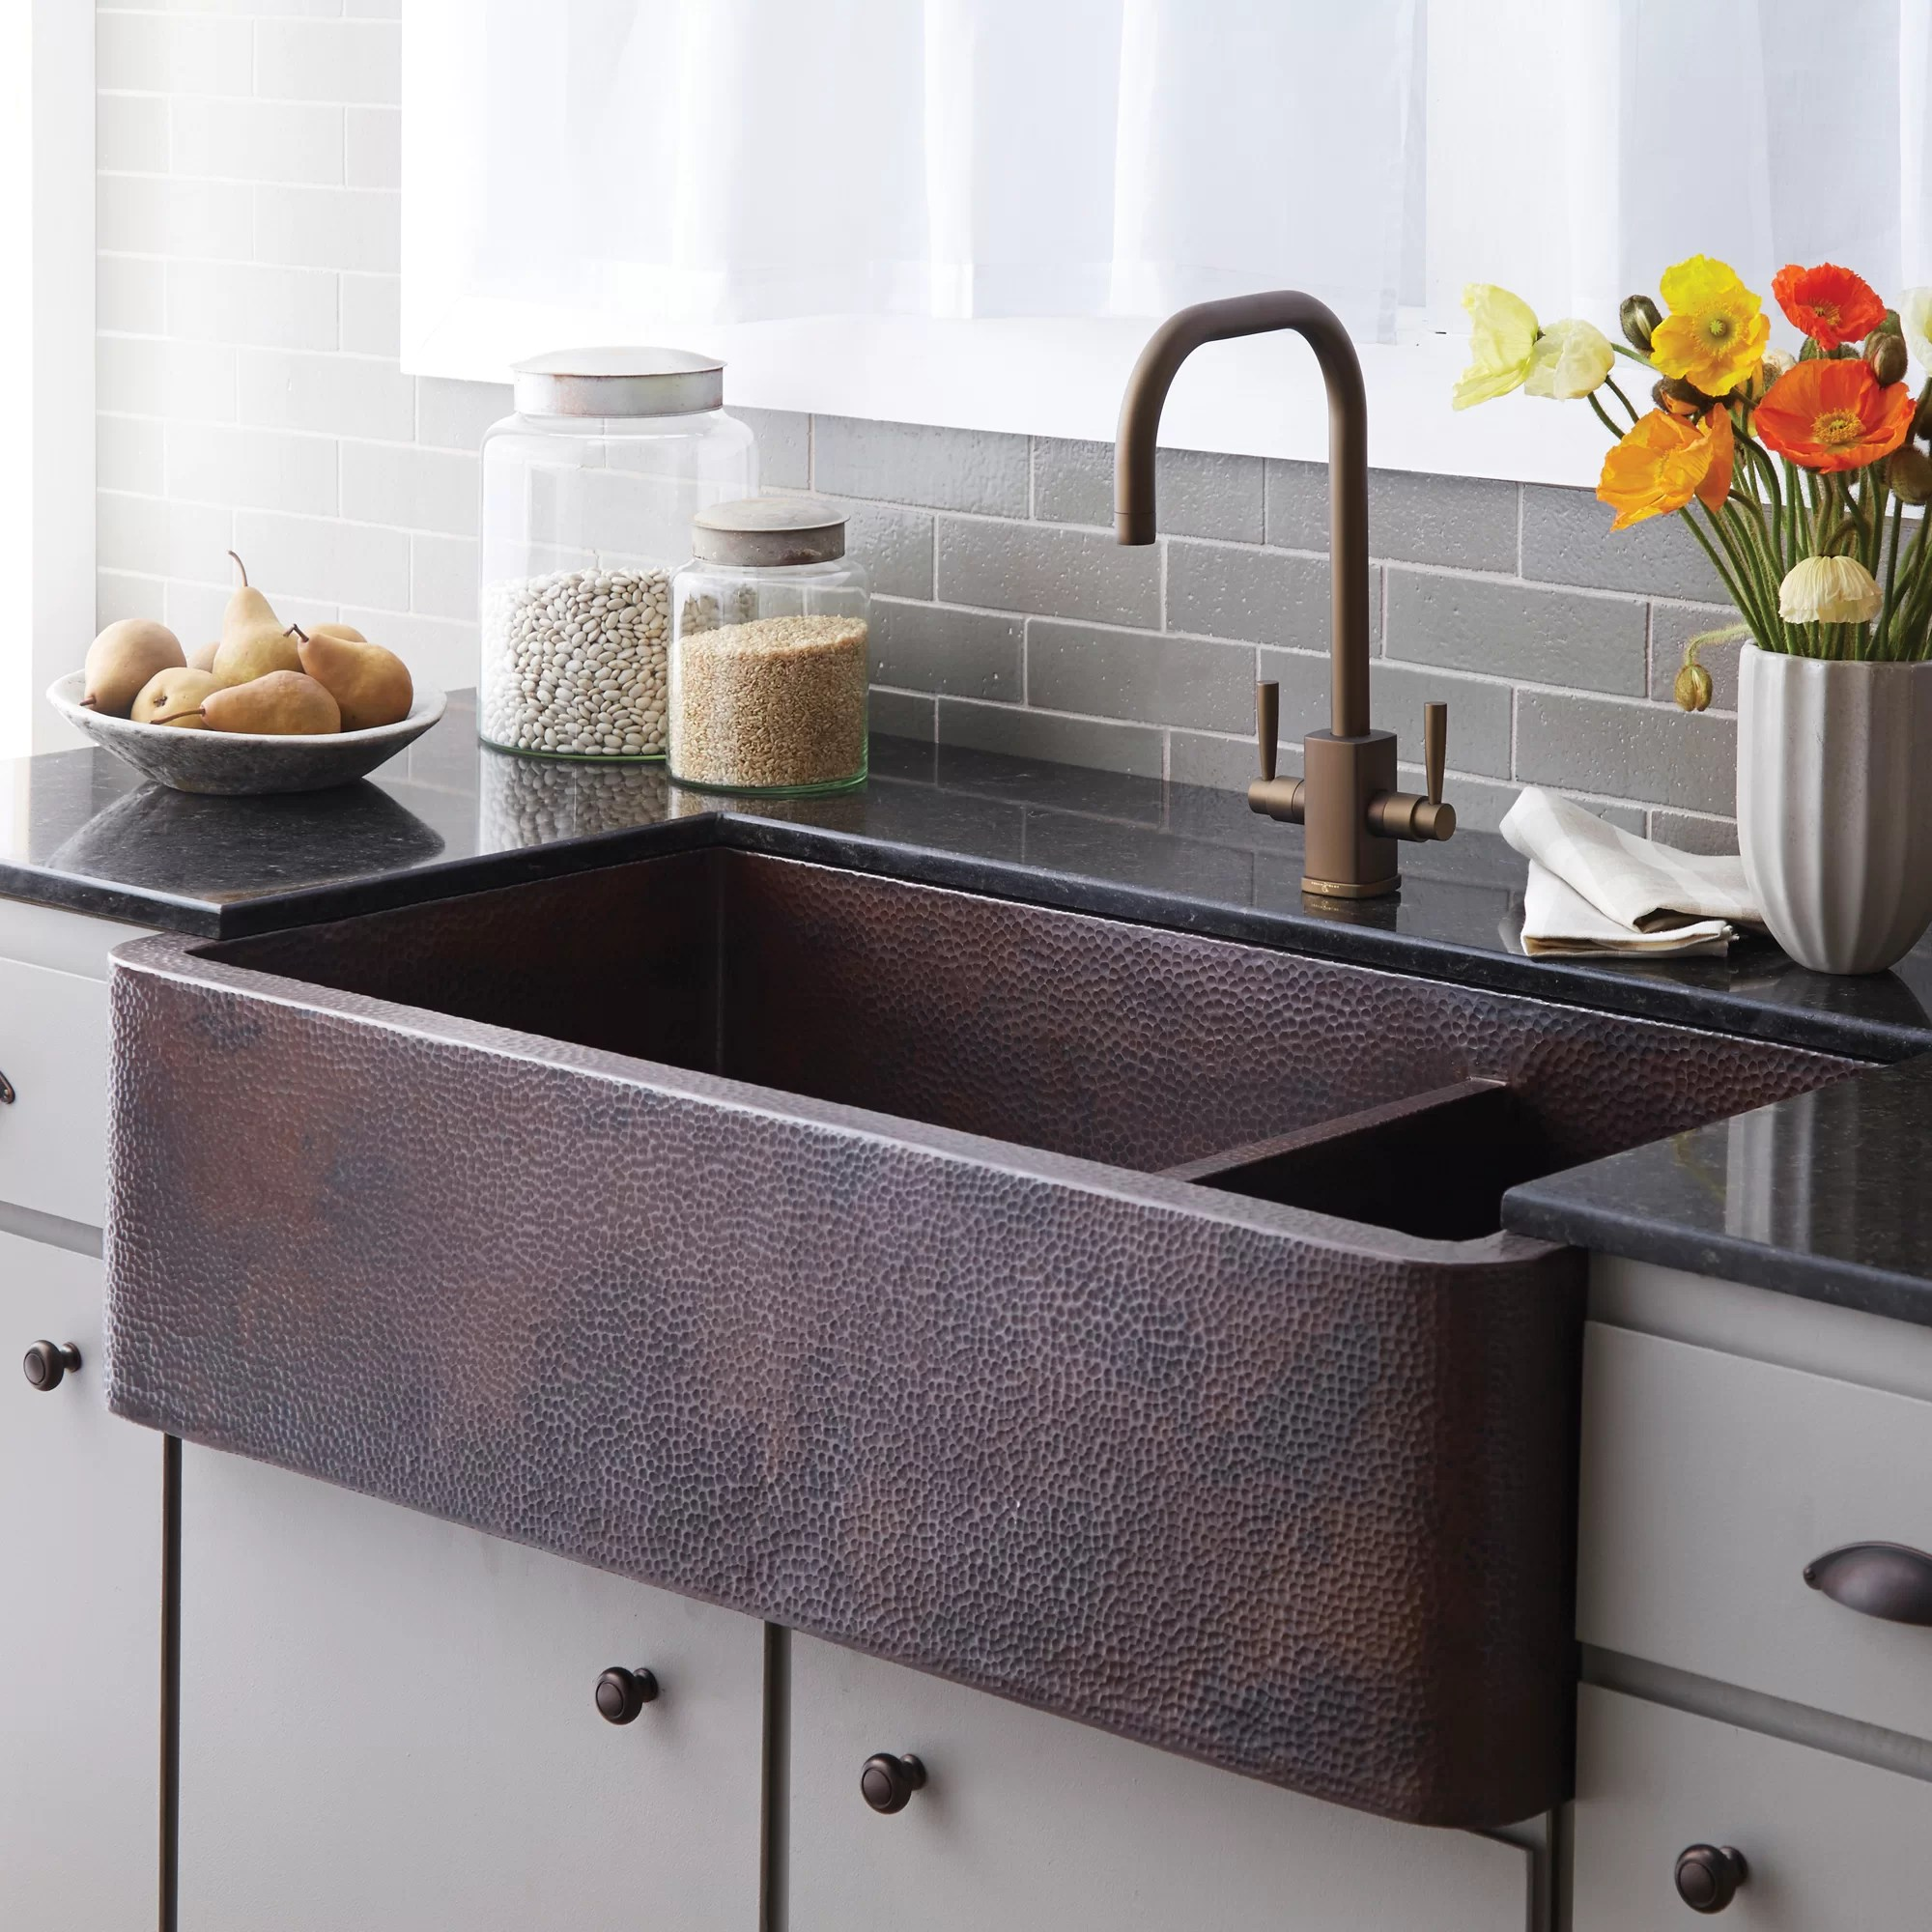 40 l x 22 w double basin farmhouse apron kitchen sink